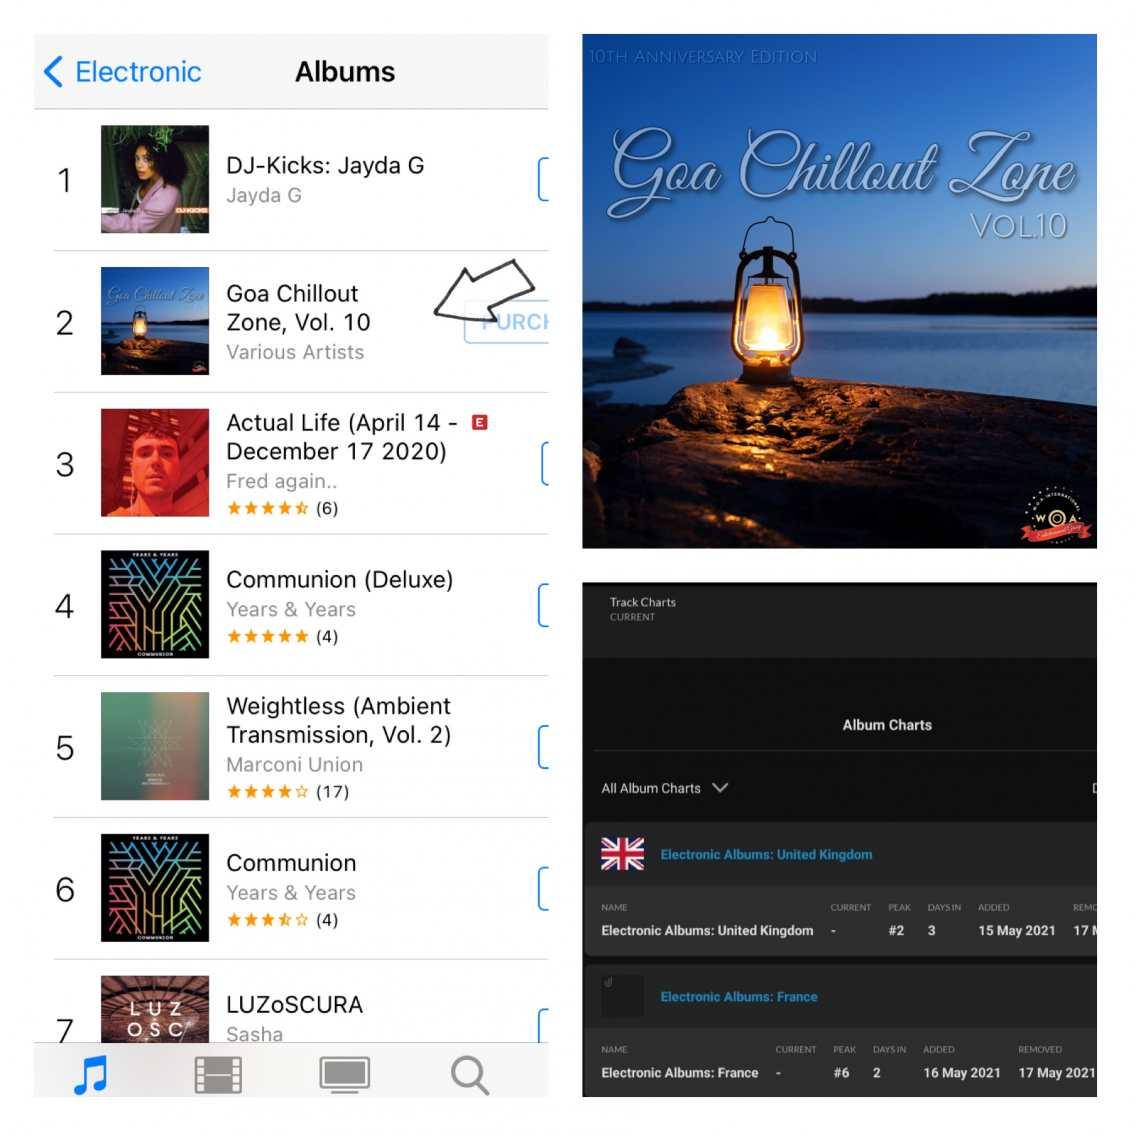 Goa Chillout Zone Vol.10 #2 UK Charts